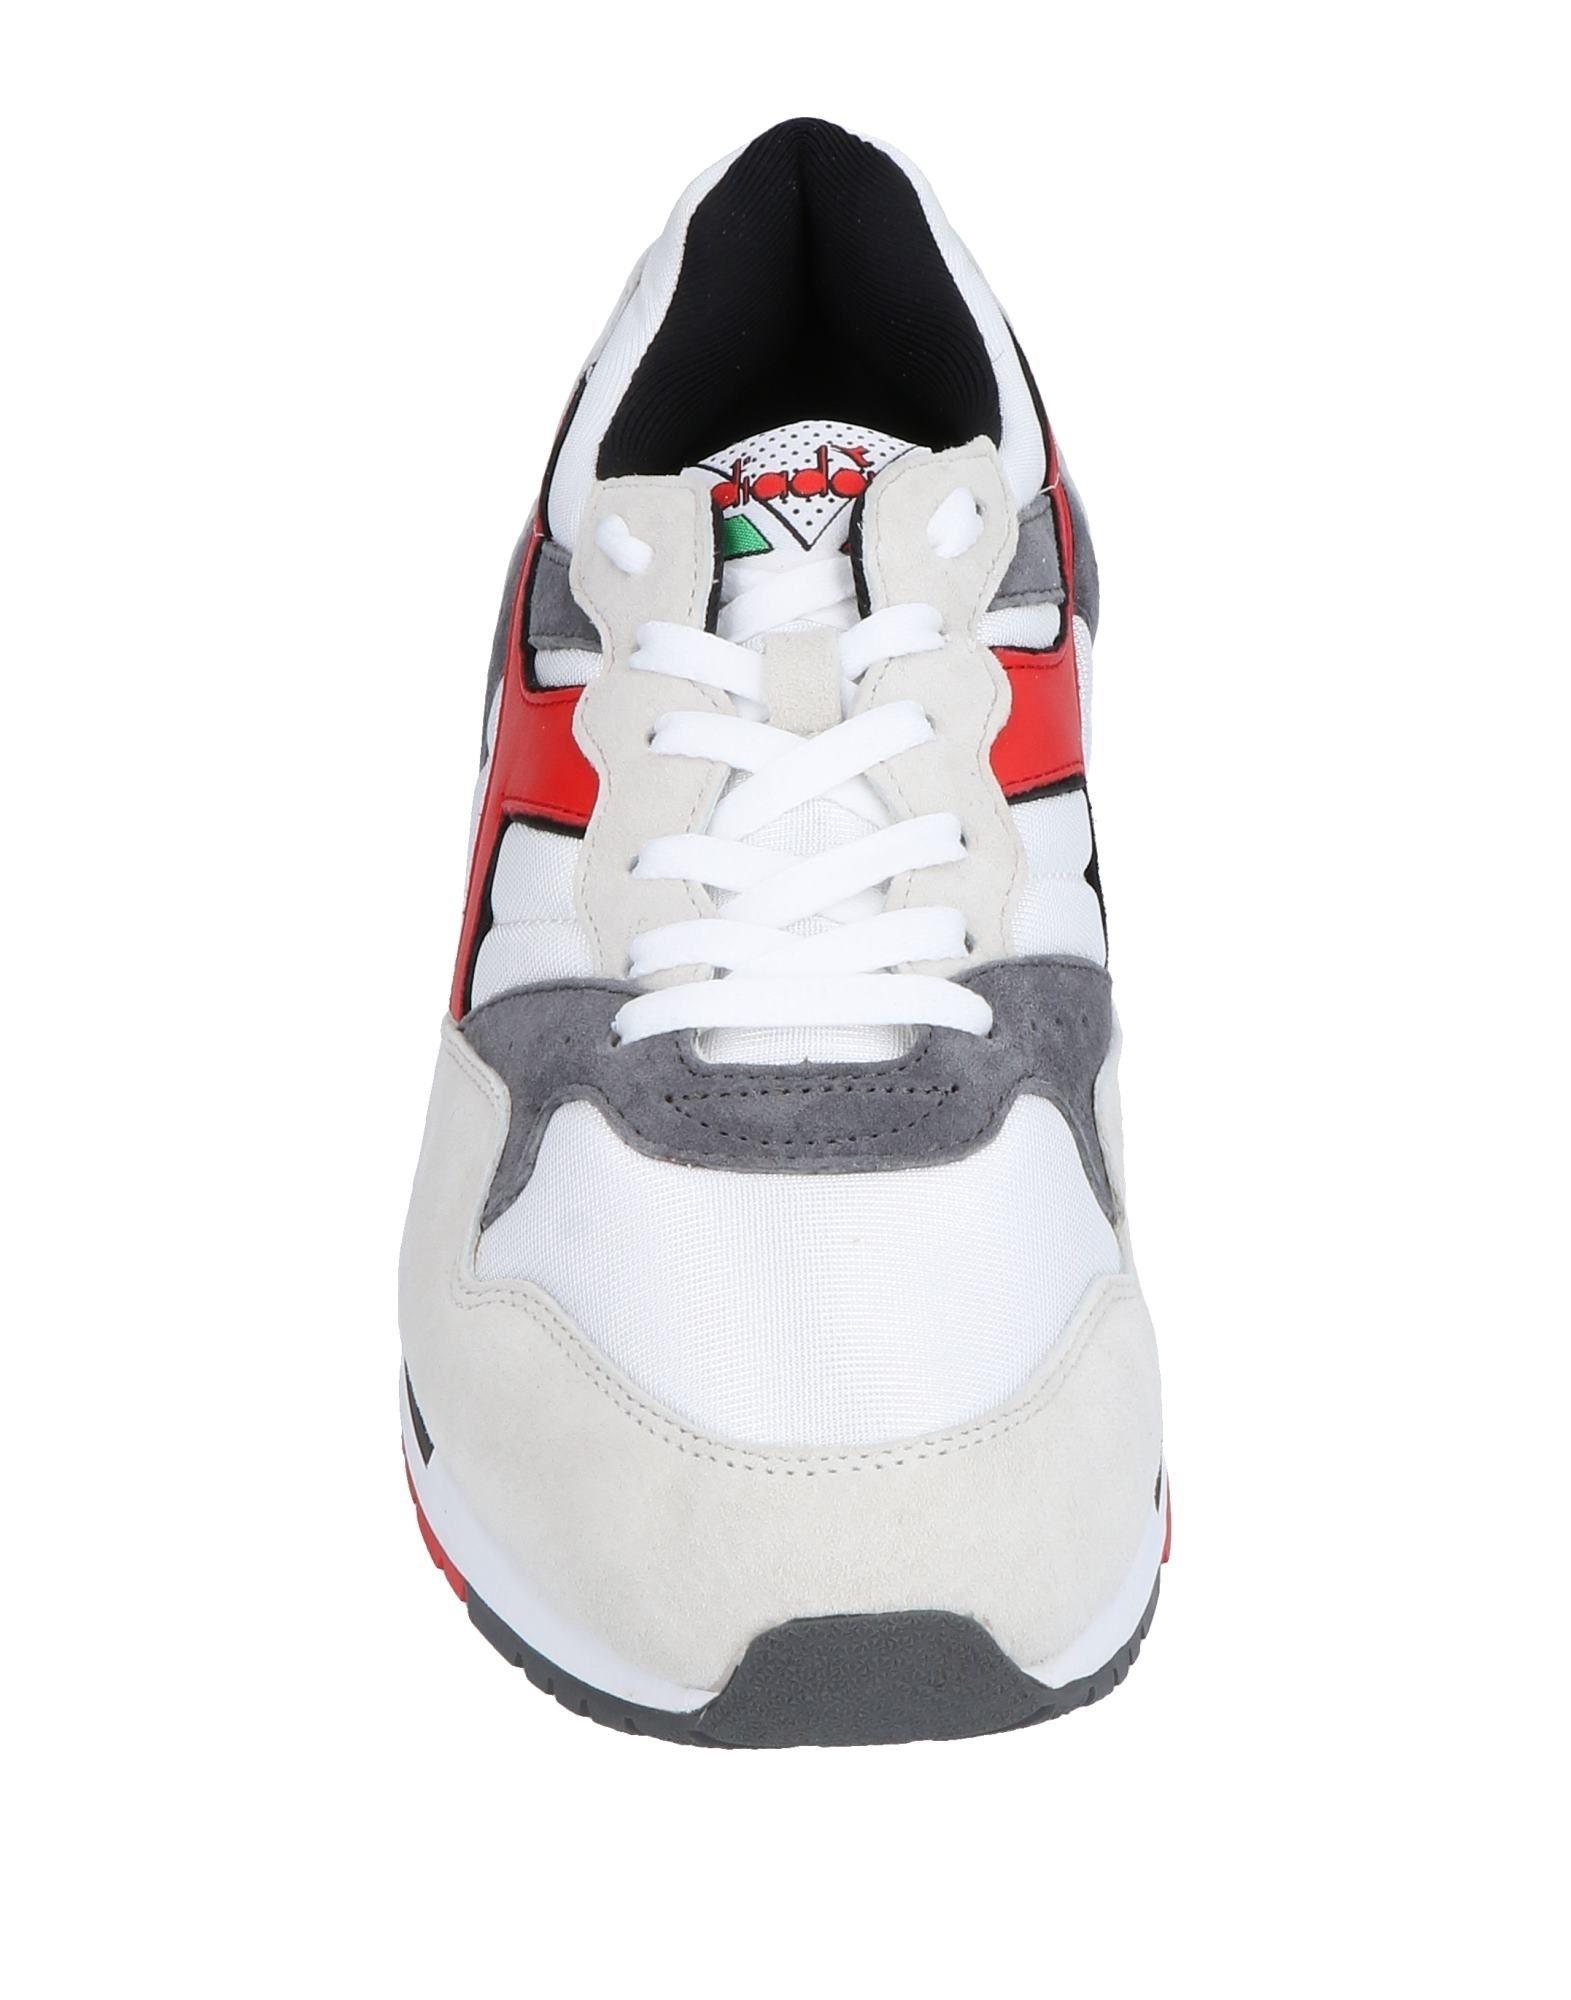 Rabatt echte Schuhe Diadora Sneakers Herren  11494163VK 11494163VK 11494163VK 8cb6b1